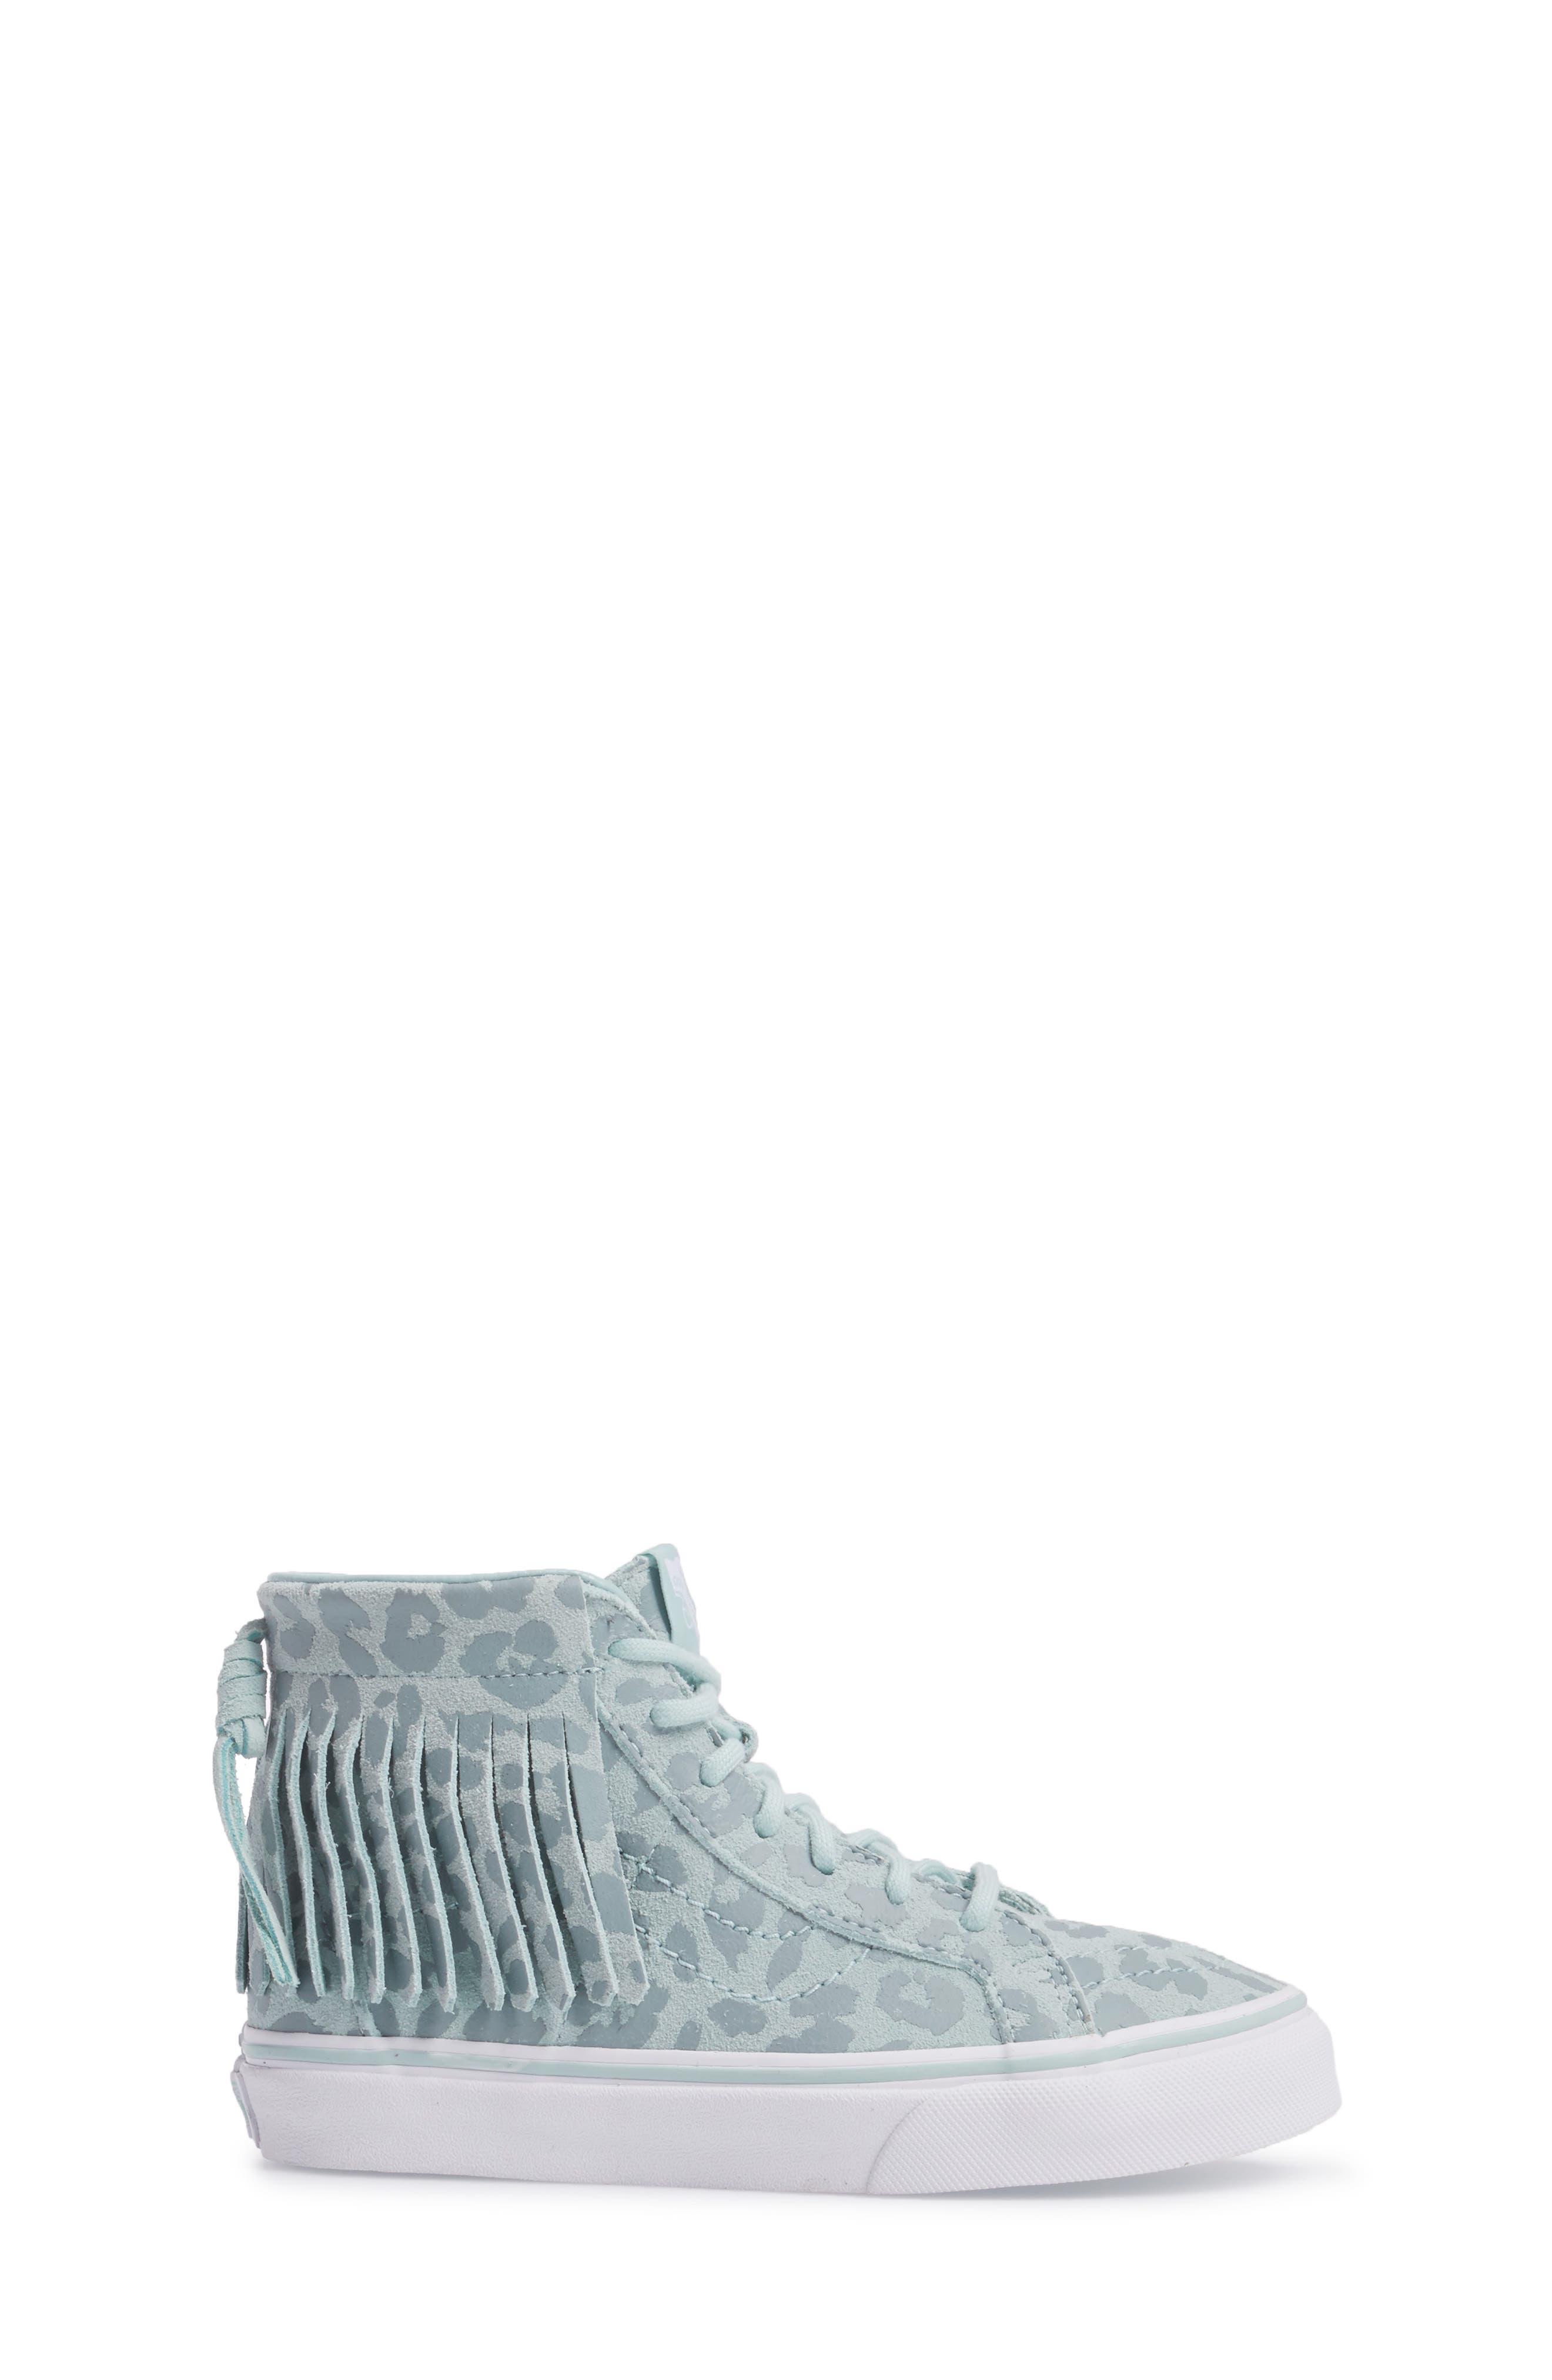 Chukka V Moc Sneaker,                             Alternate thumbnail 3, color,                             Harbor Gray Leopard Suede